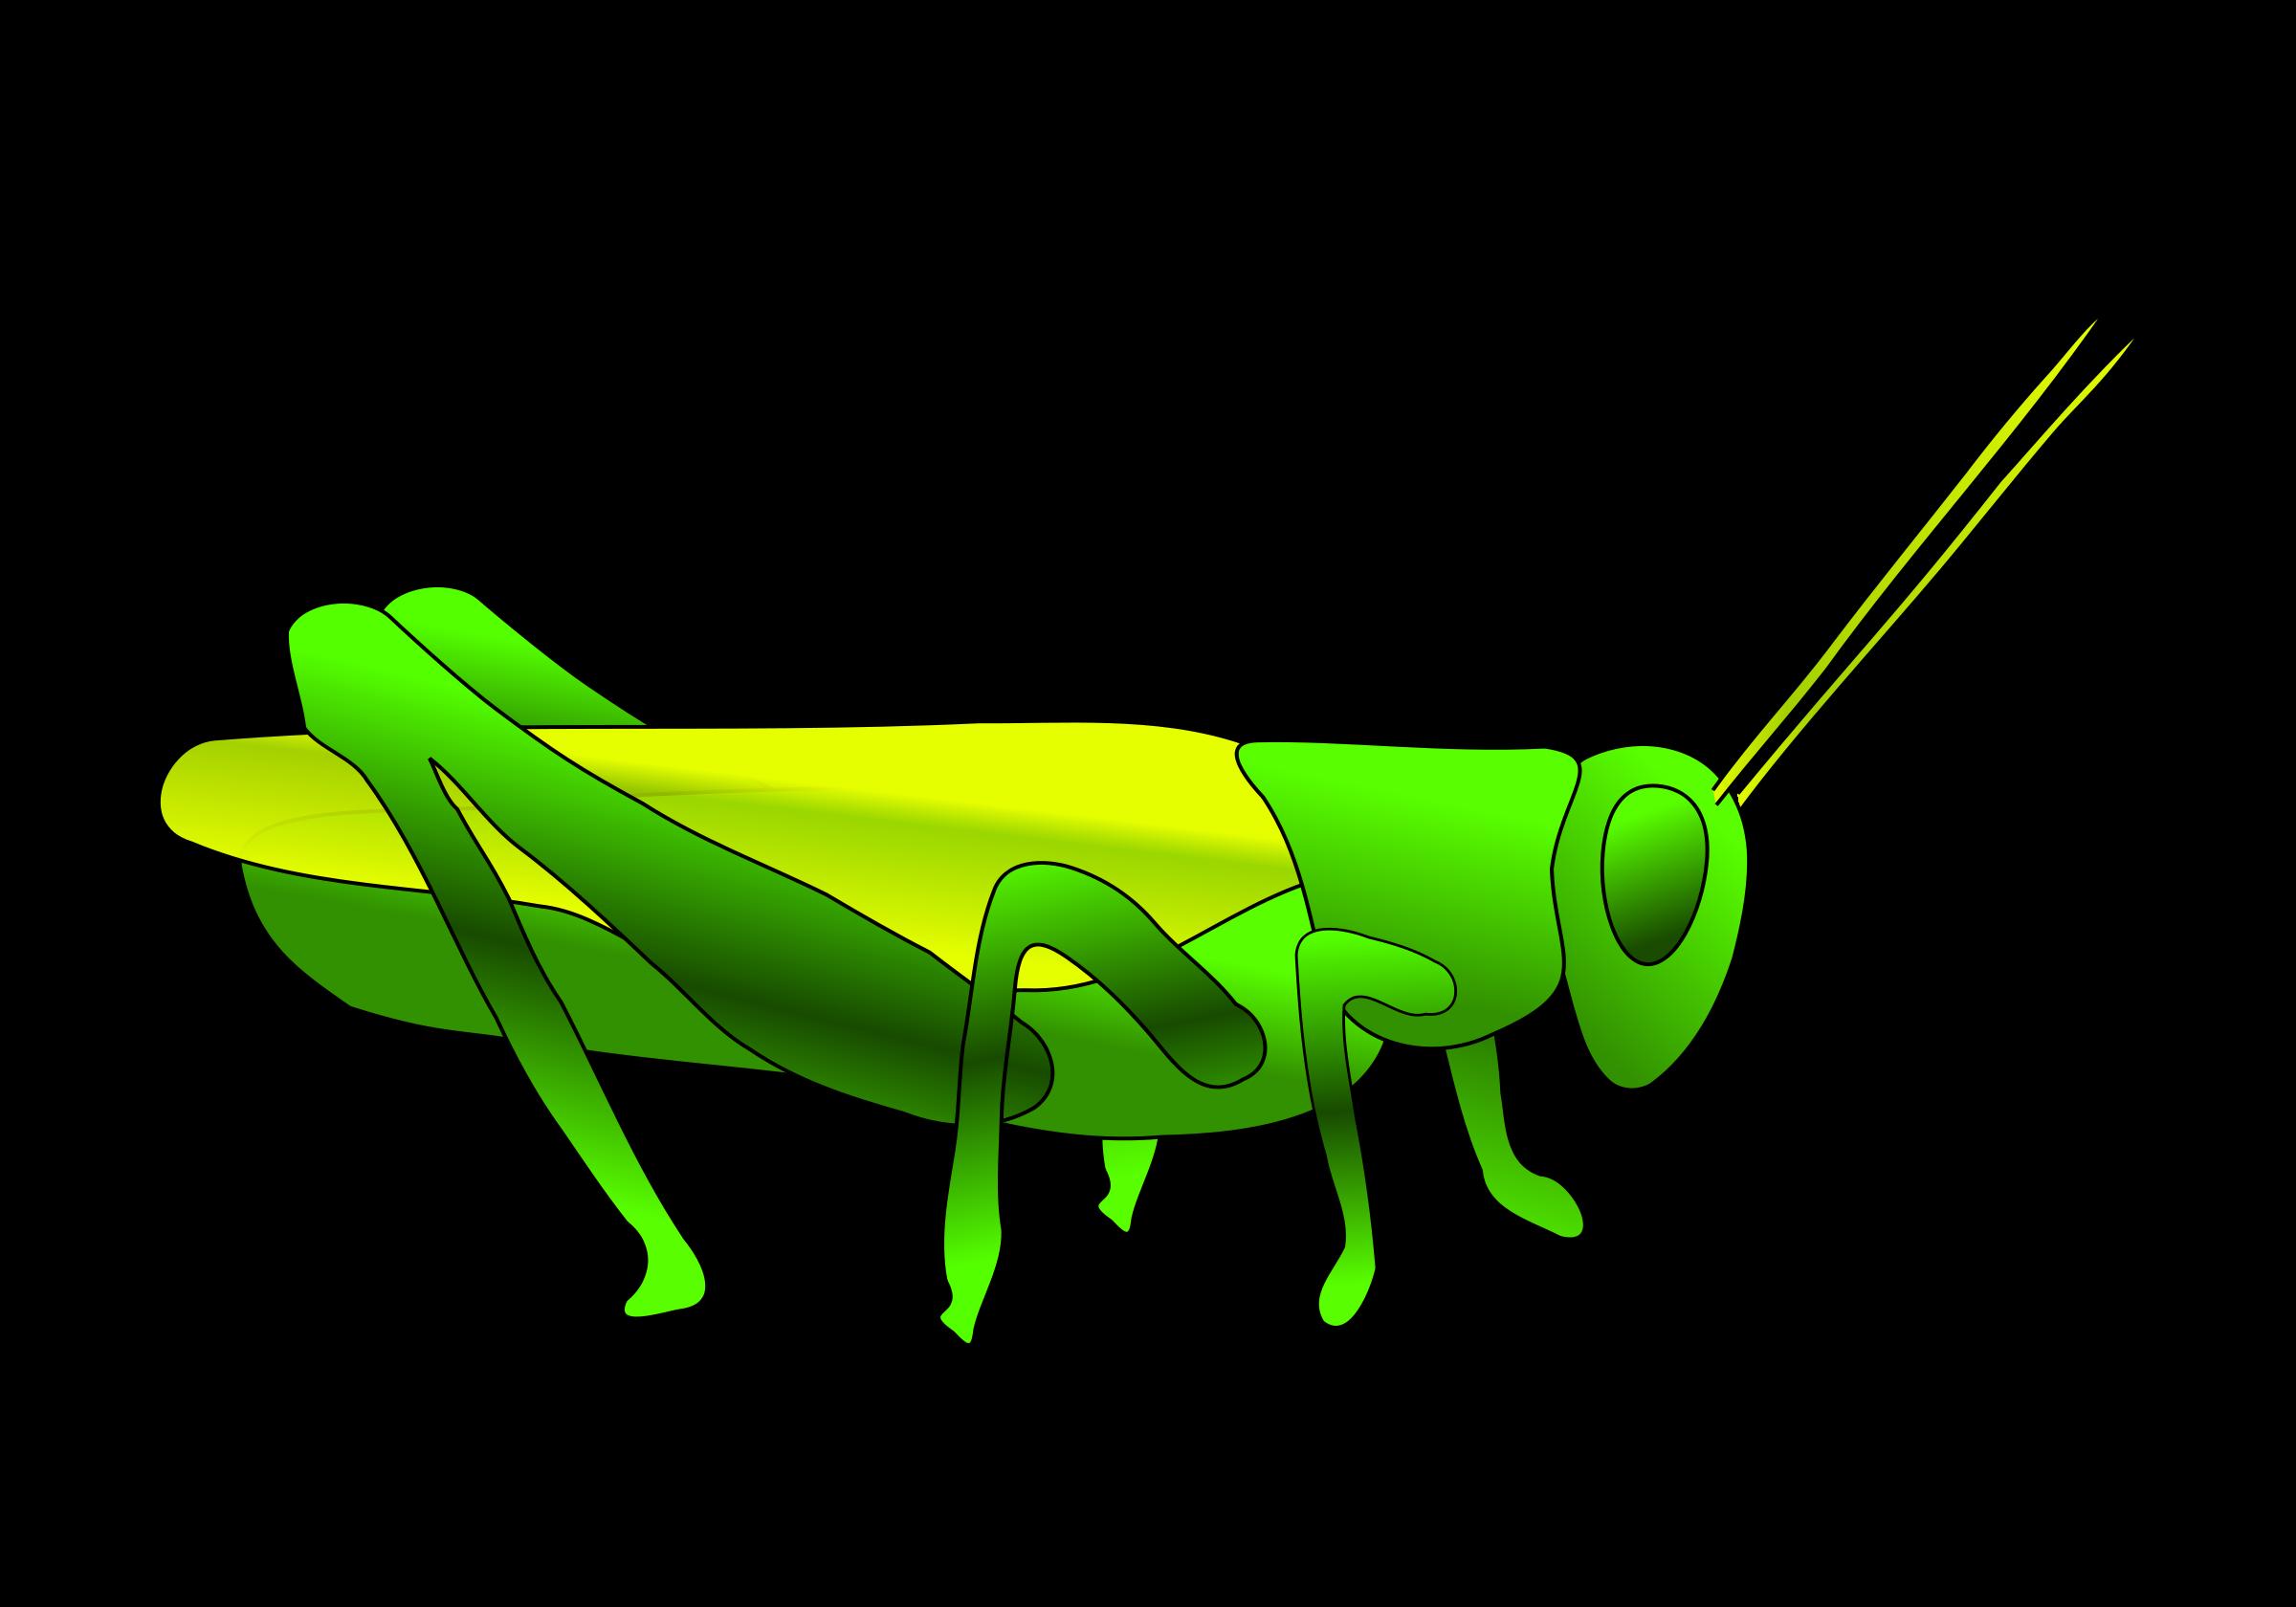 grasshopper clip art clipart panda free clipart images rh clipartpanda com grasshopper clipart black and white animated grasshopper clipart